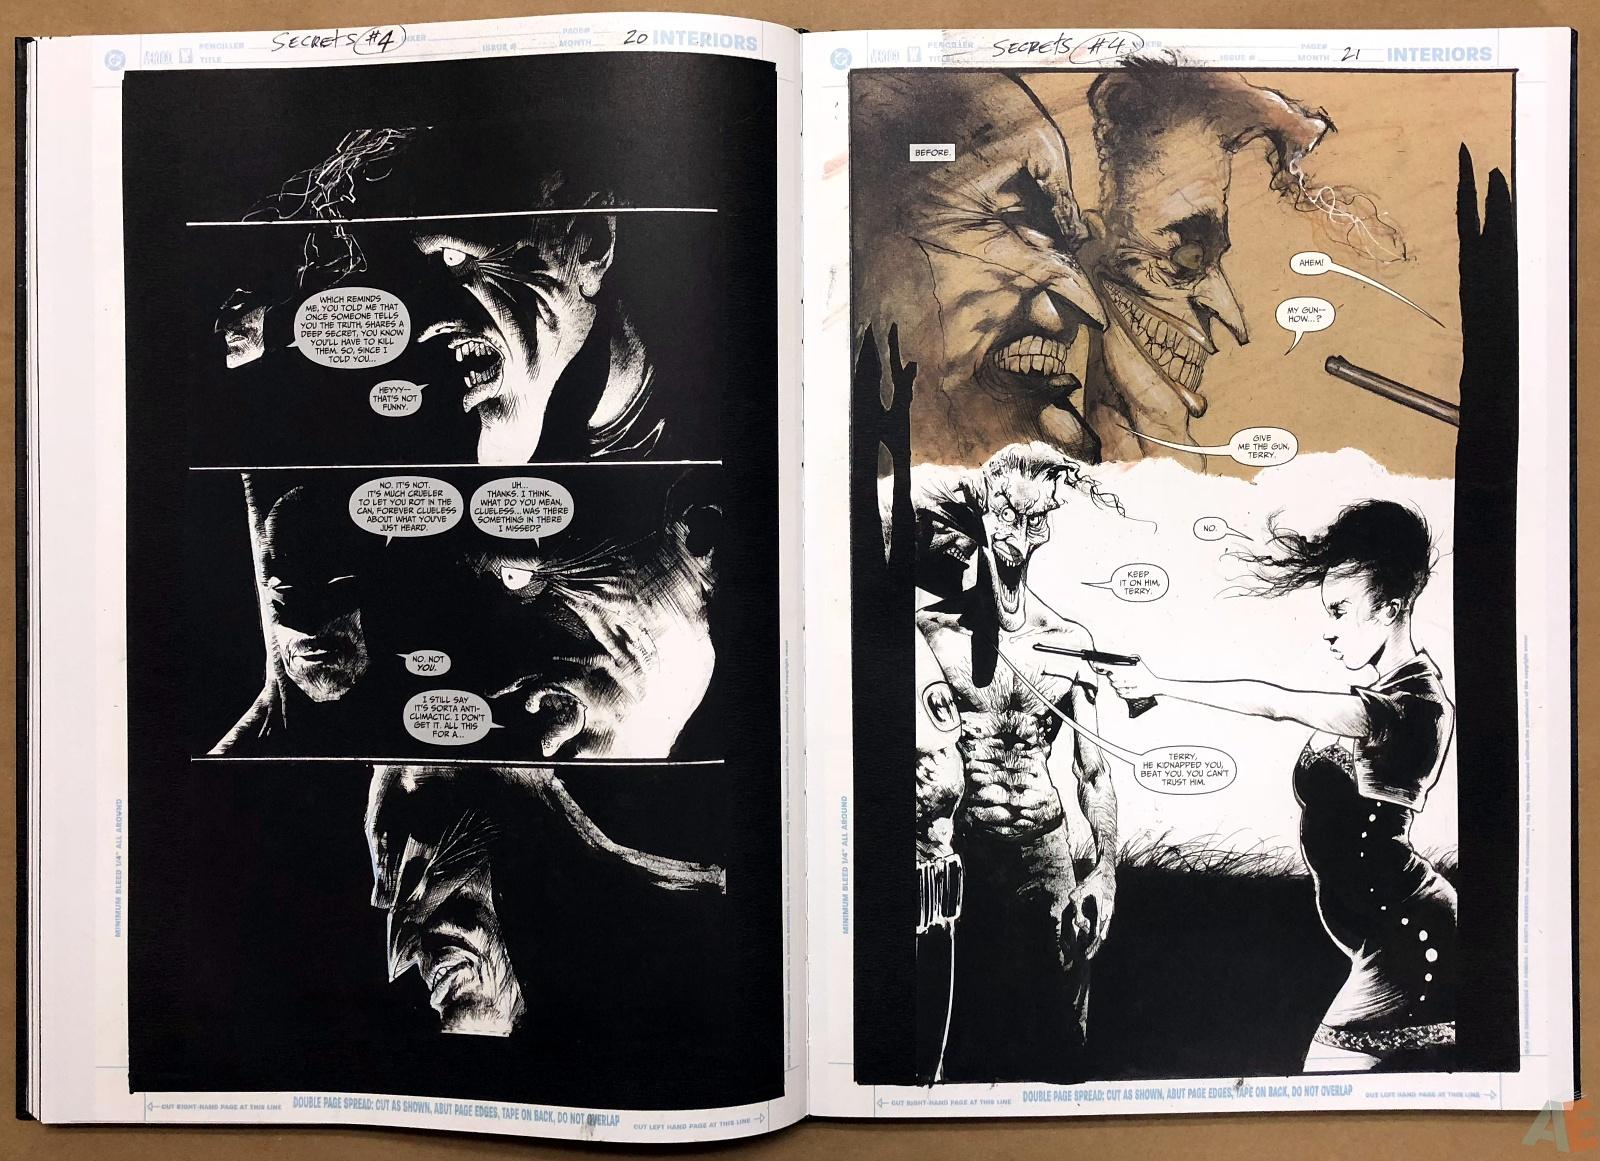 Batman: Secrets – Sam Kieth Gallery Edition 25